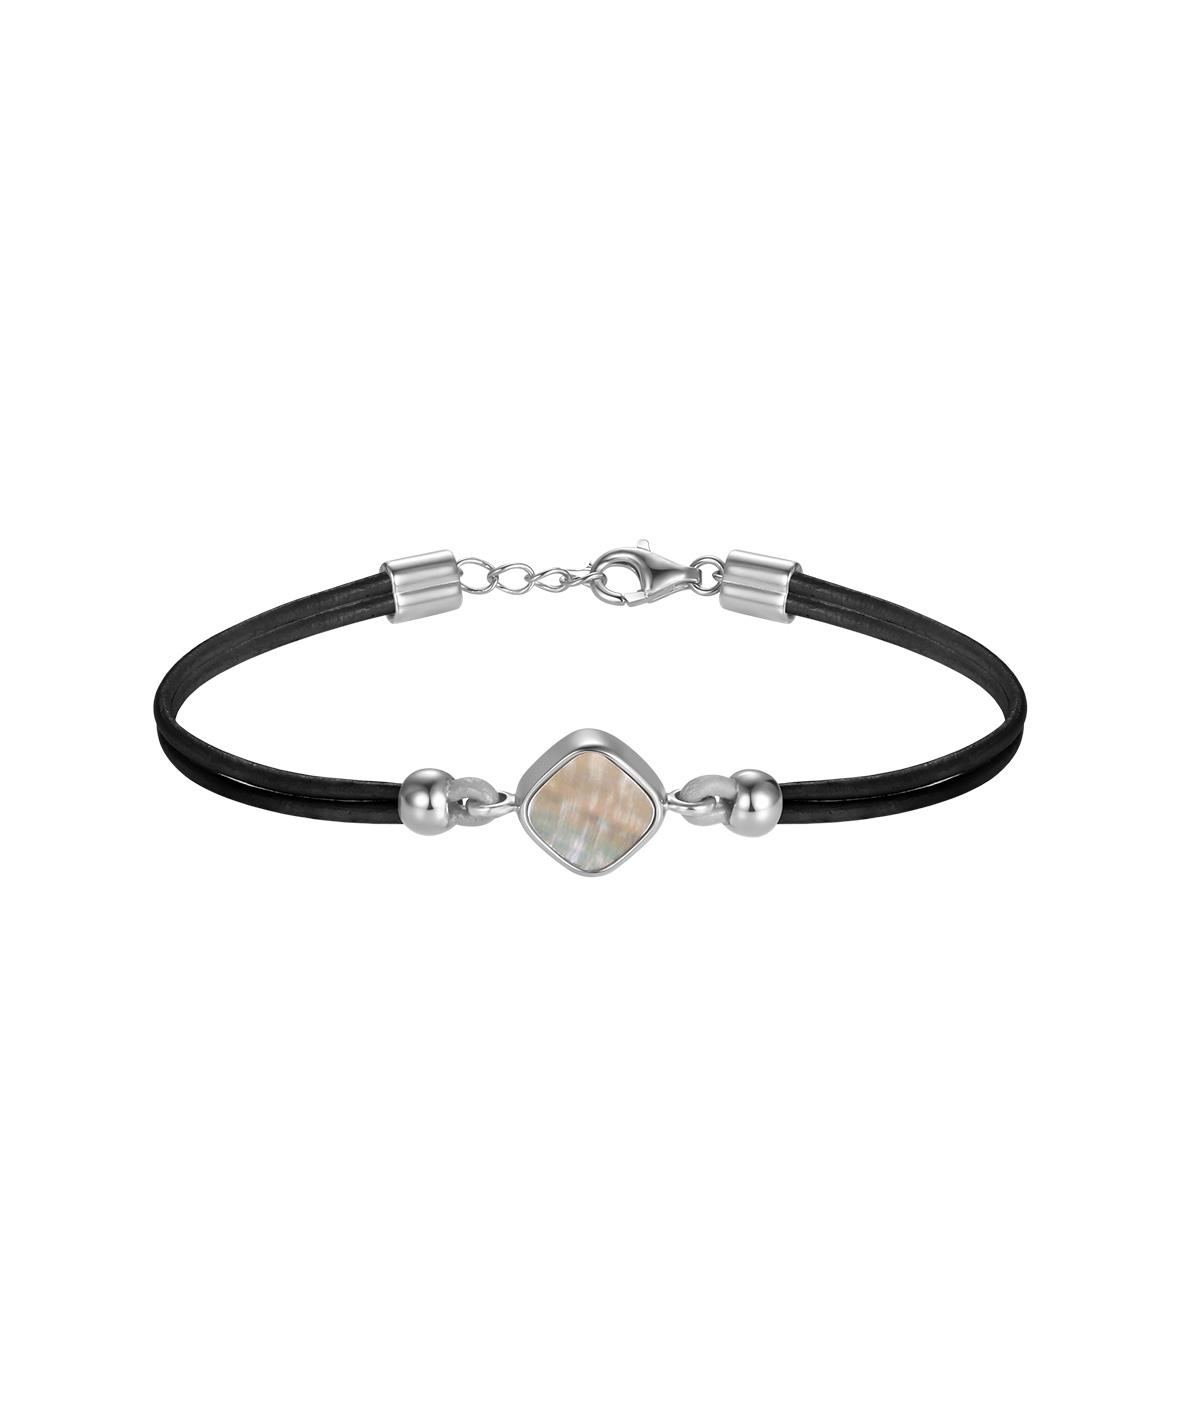 Ormer Silver Leather Bracelet